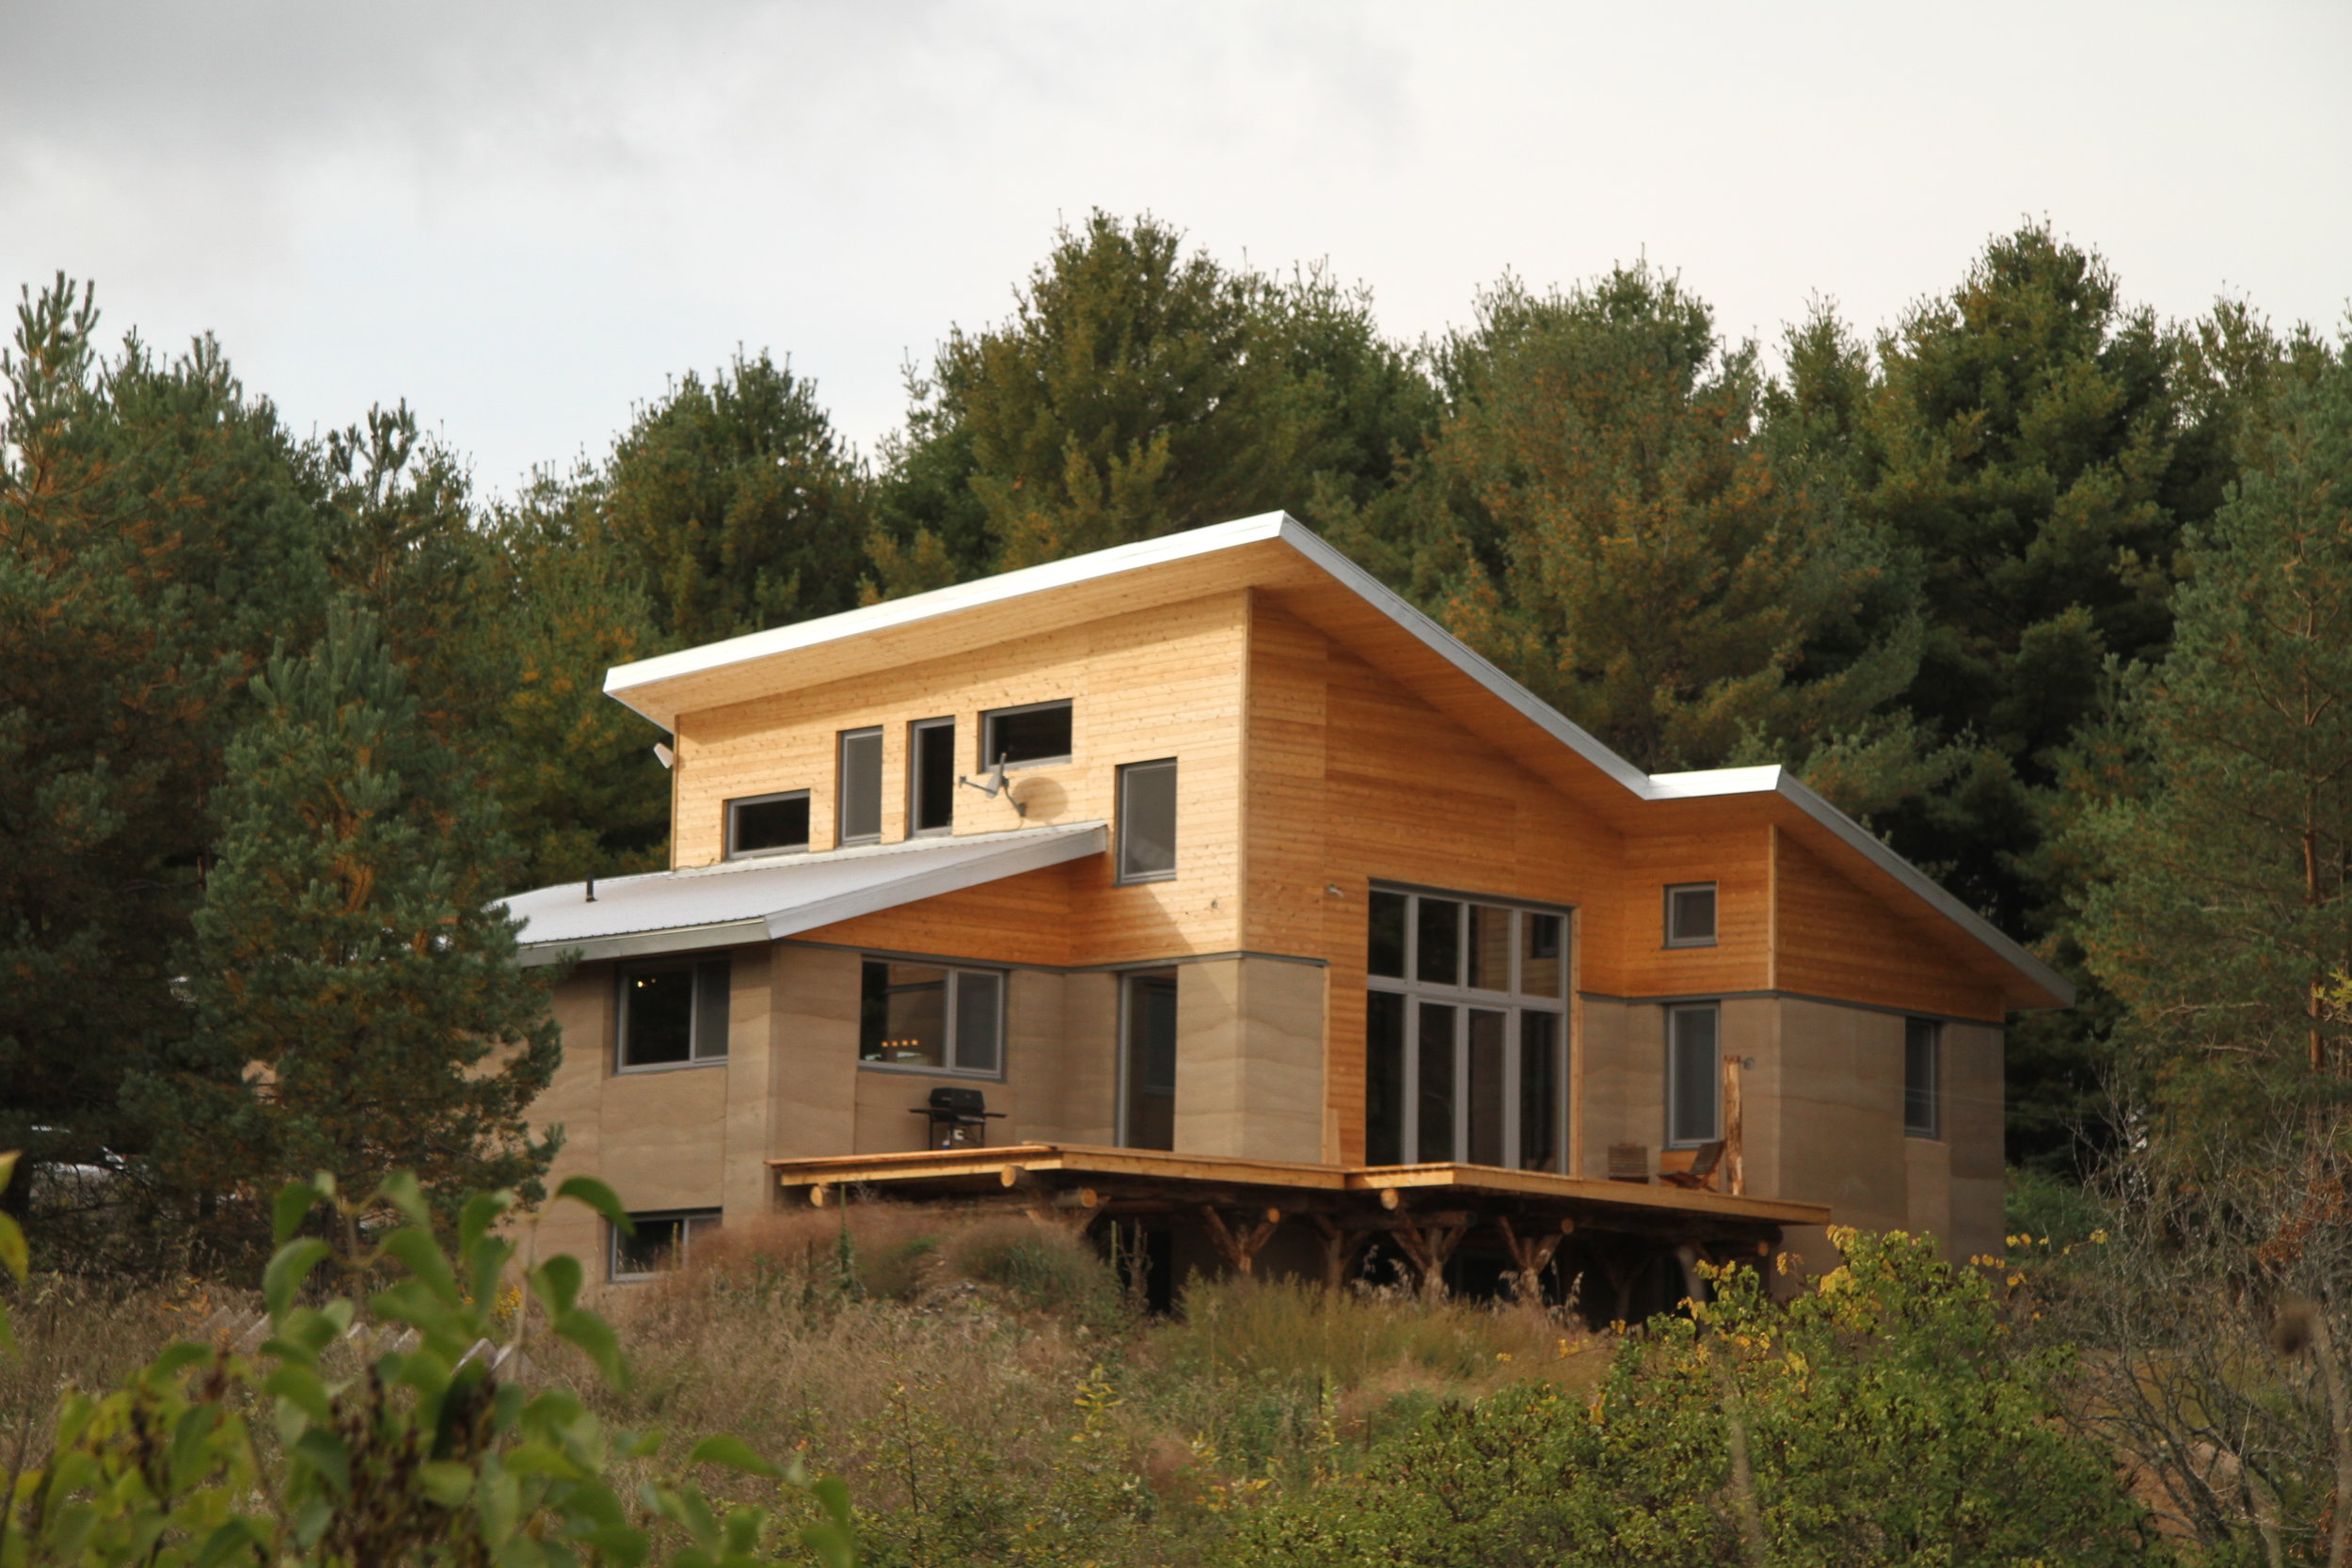 Architect: Stone's Throw Builder: Aerecura